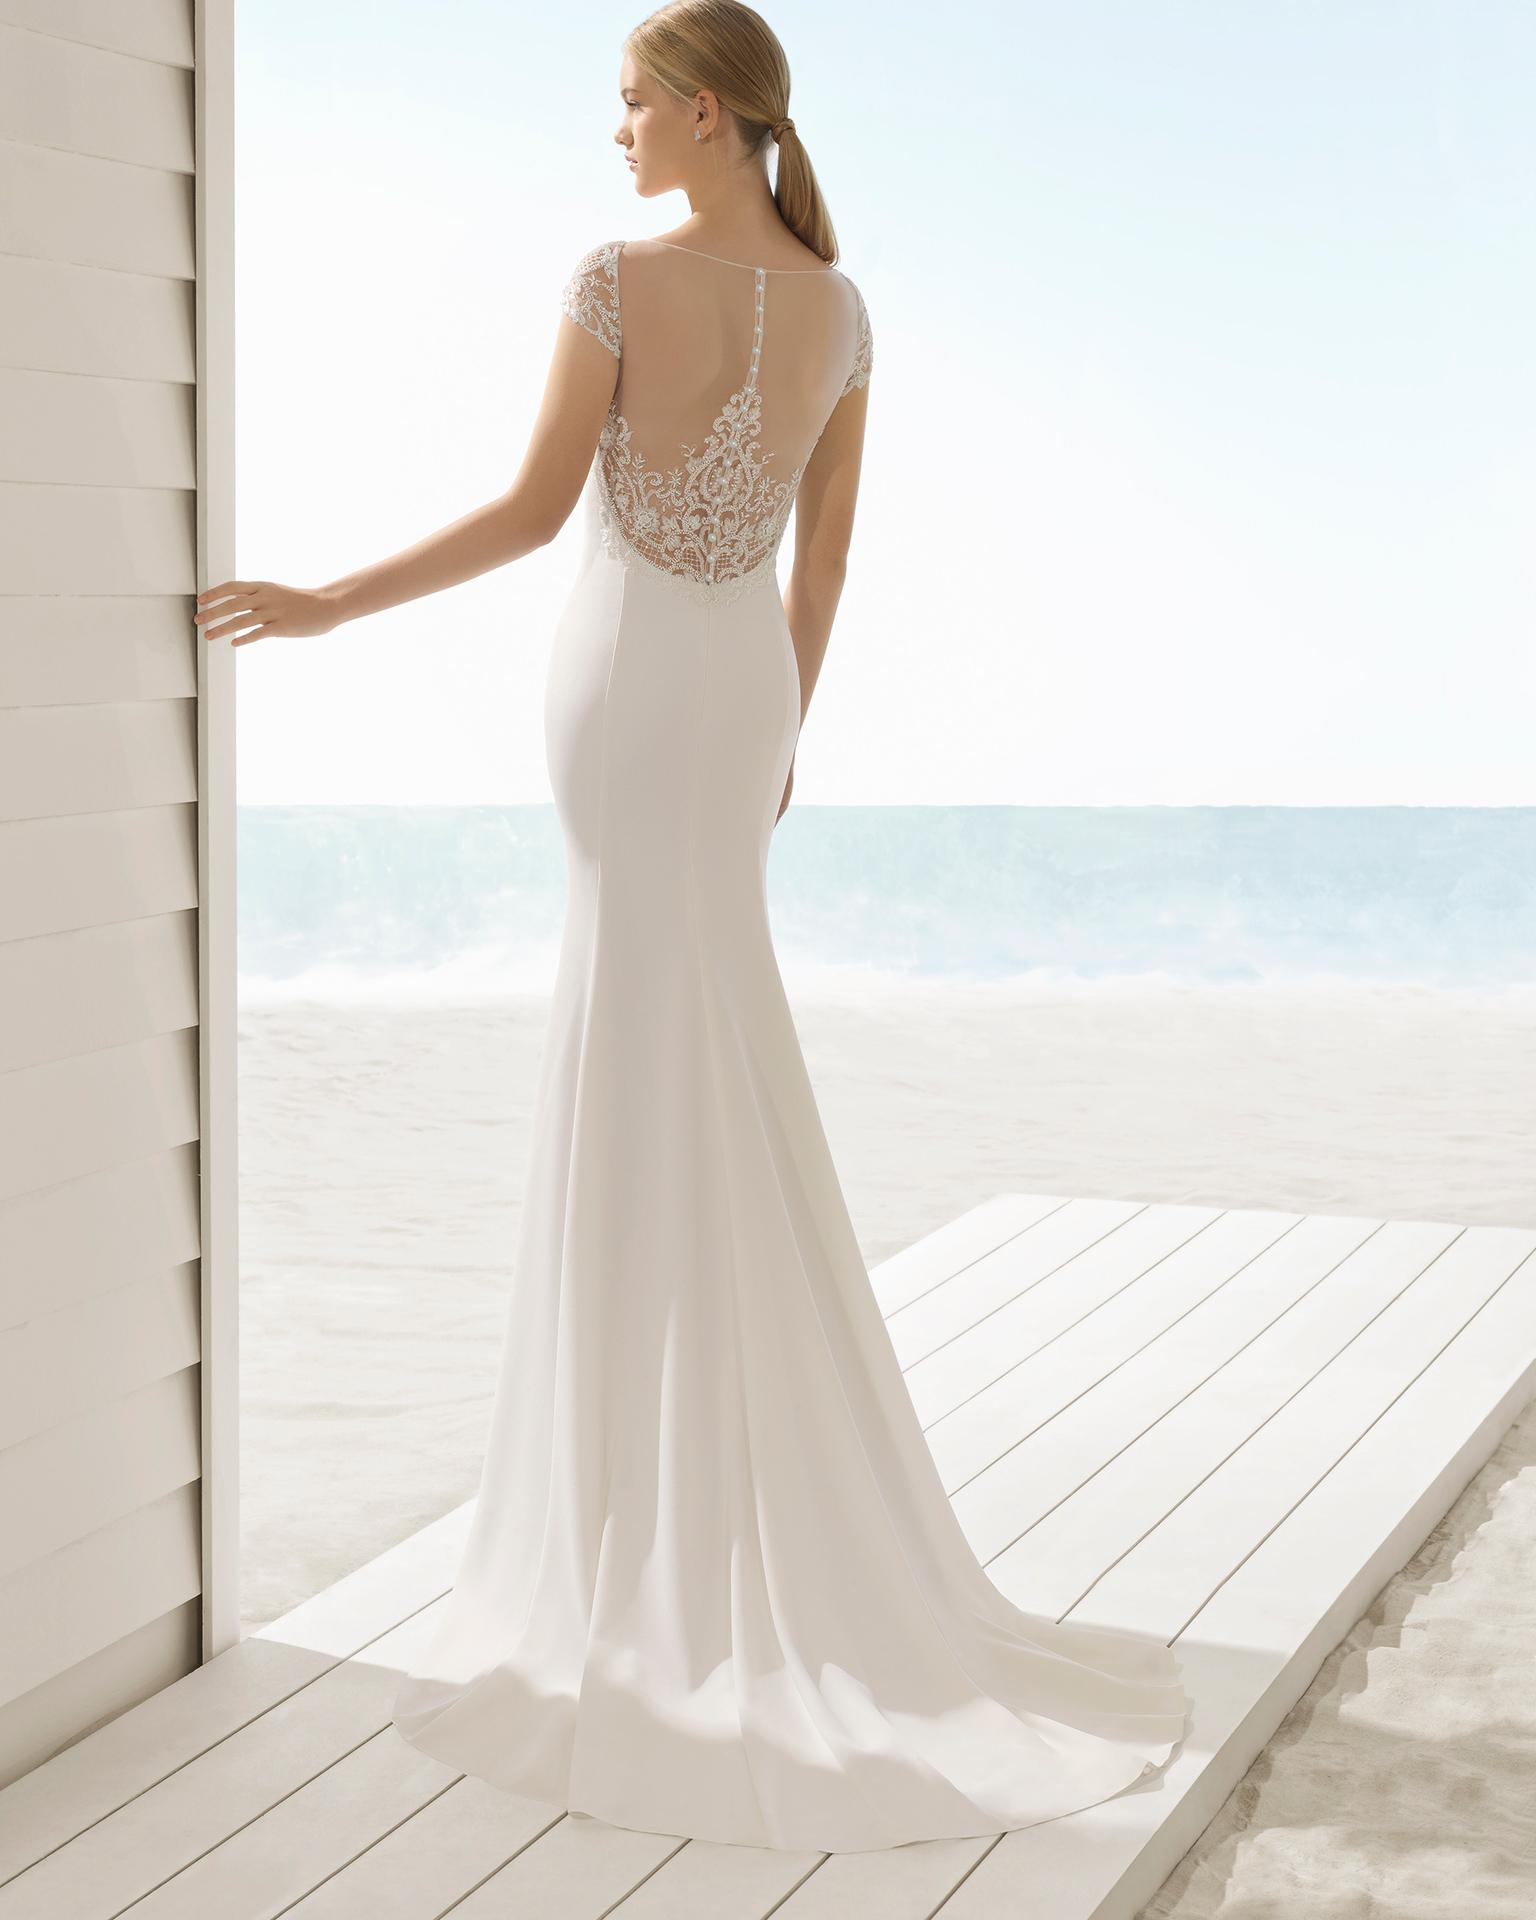 Vestido de novia estilo sirena en crepe con espalda joya.